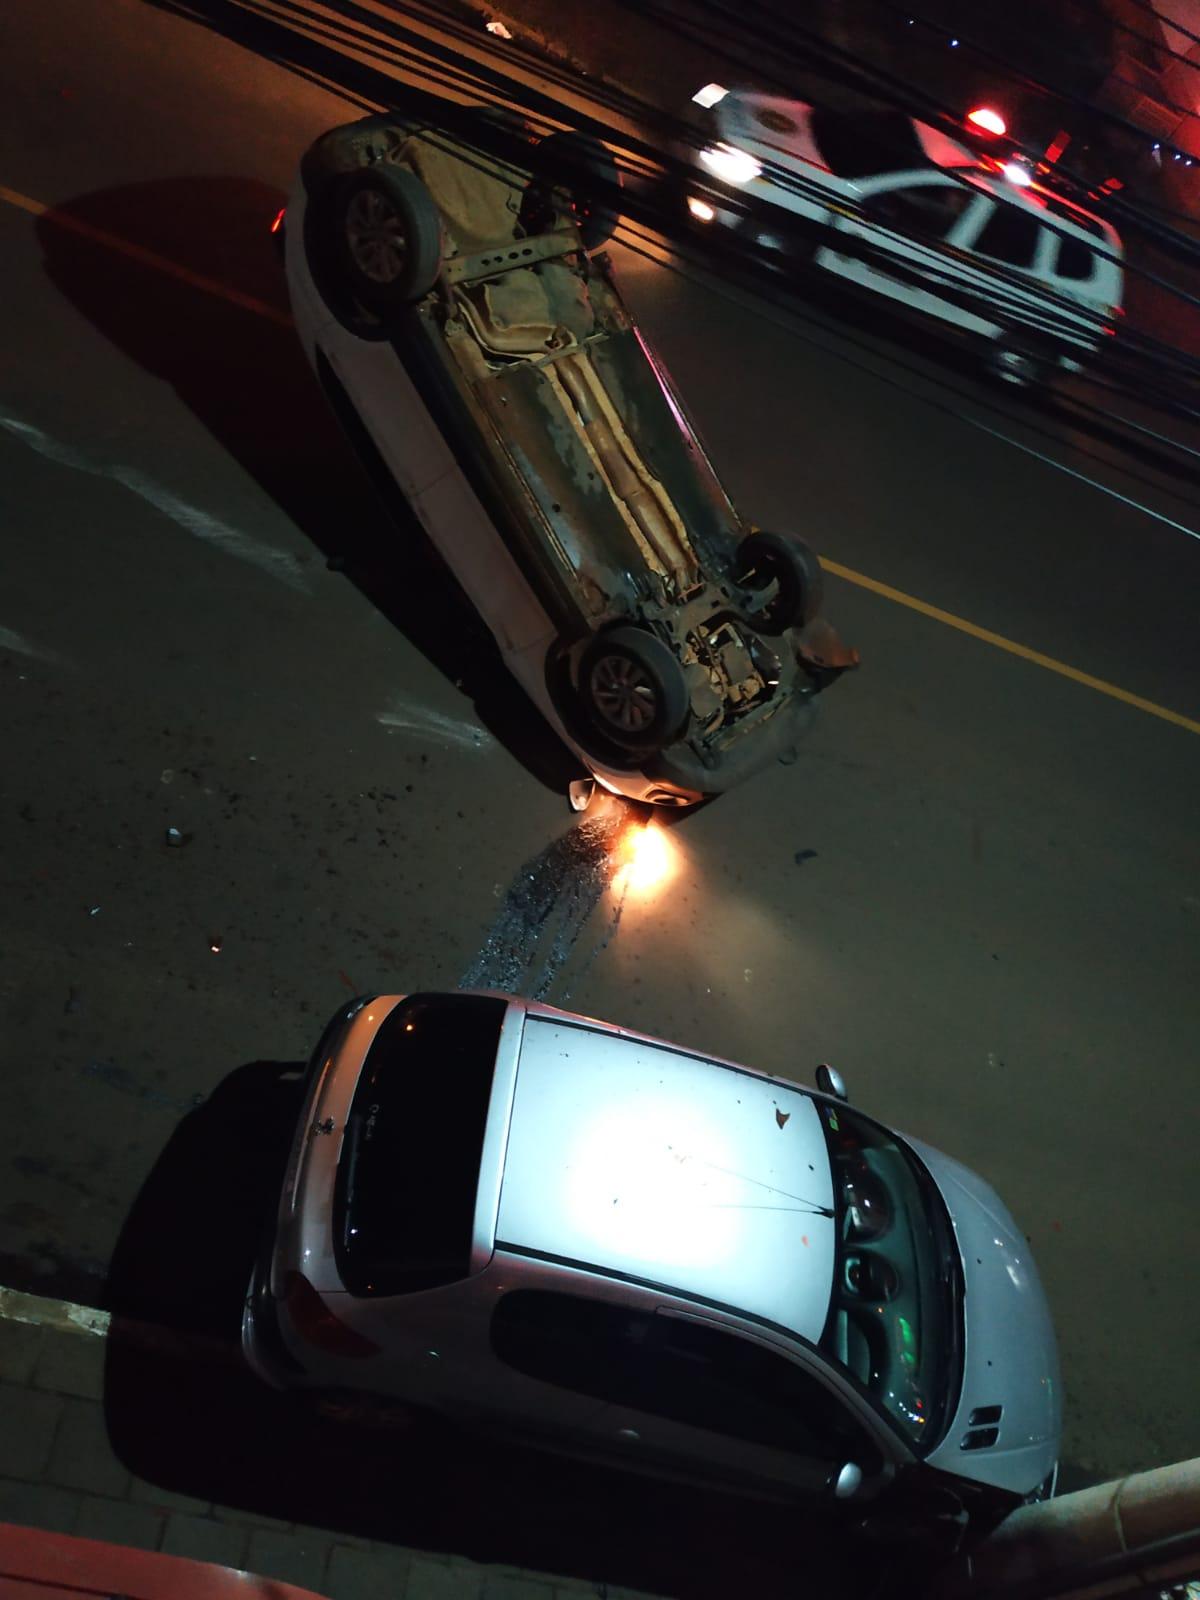 Motorista perde controle e carro capota na Av Pio XII